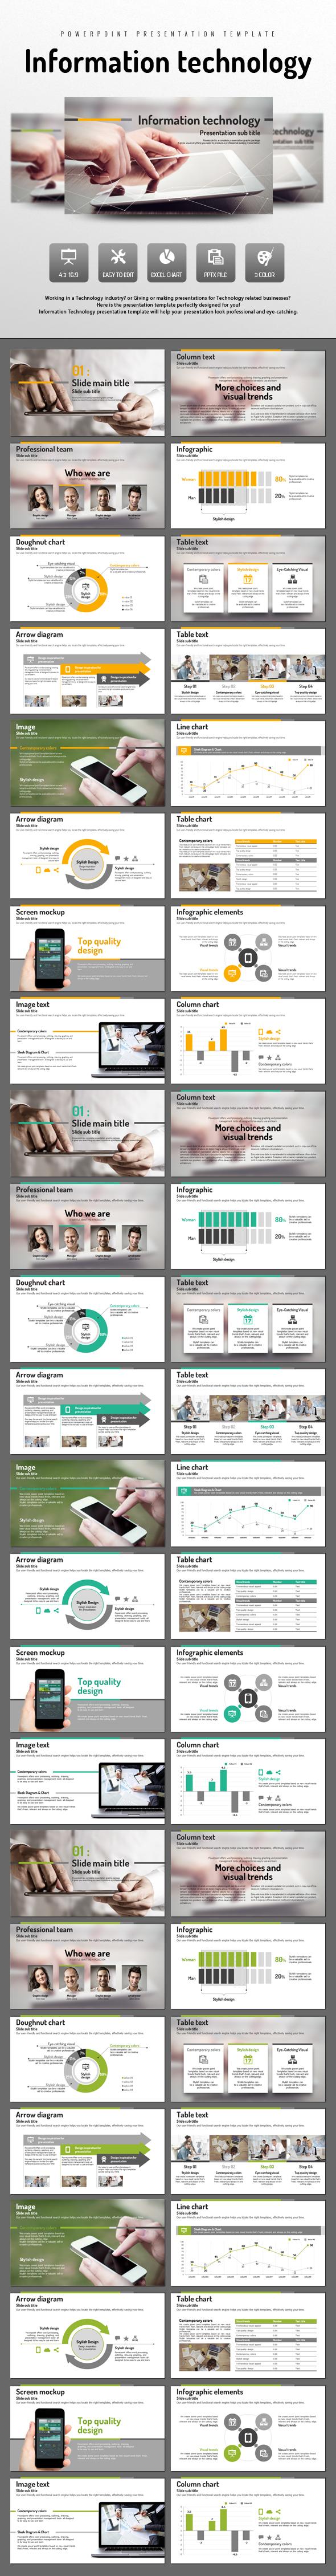 Information Technology - PowerPoint Templates Presentation Templates